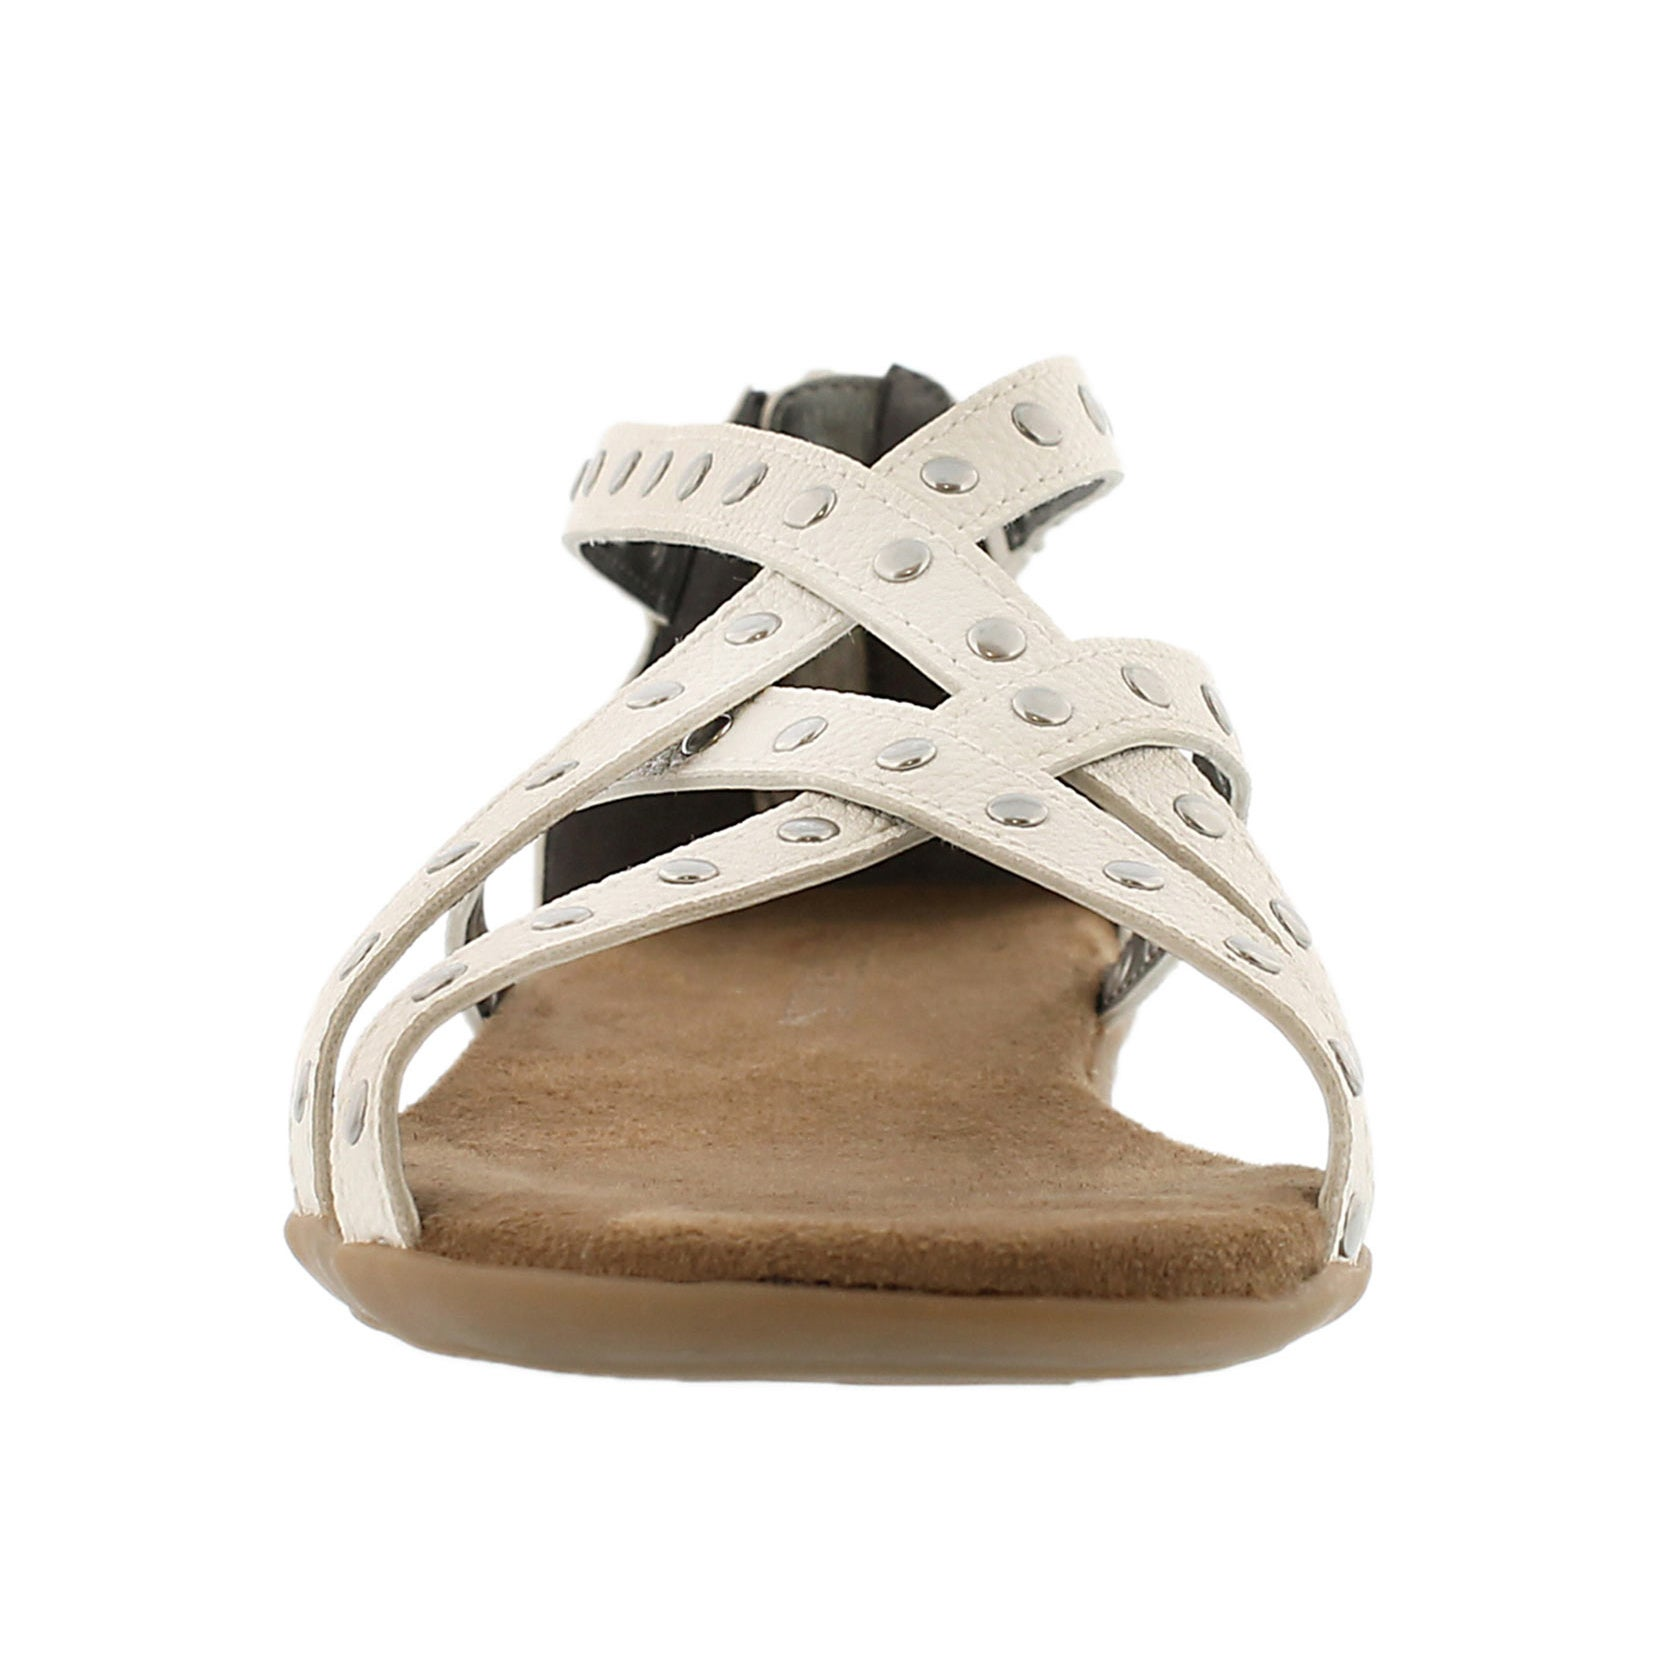 Lds Chlosing Time white gladiator sandal